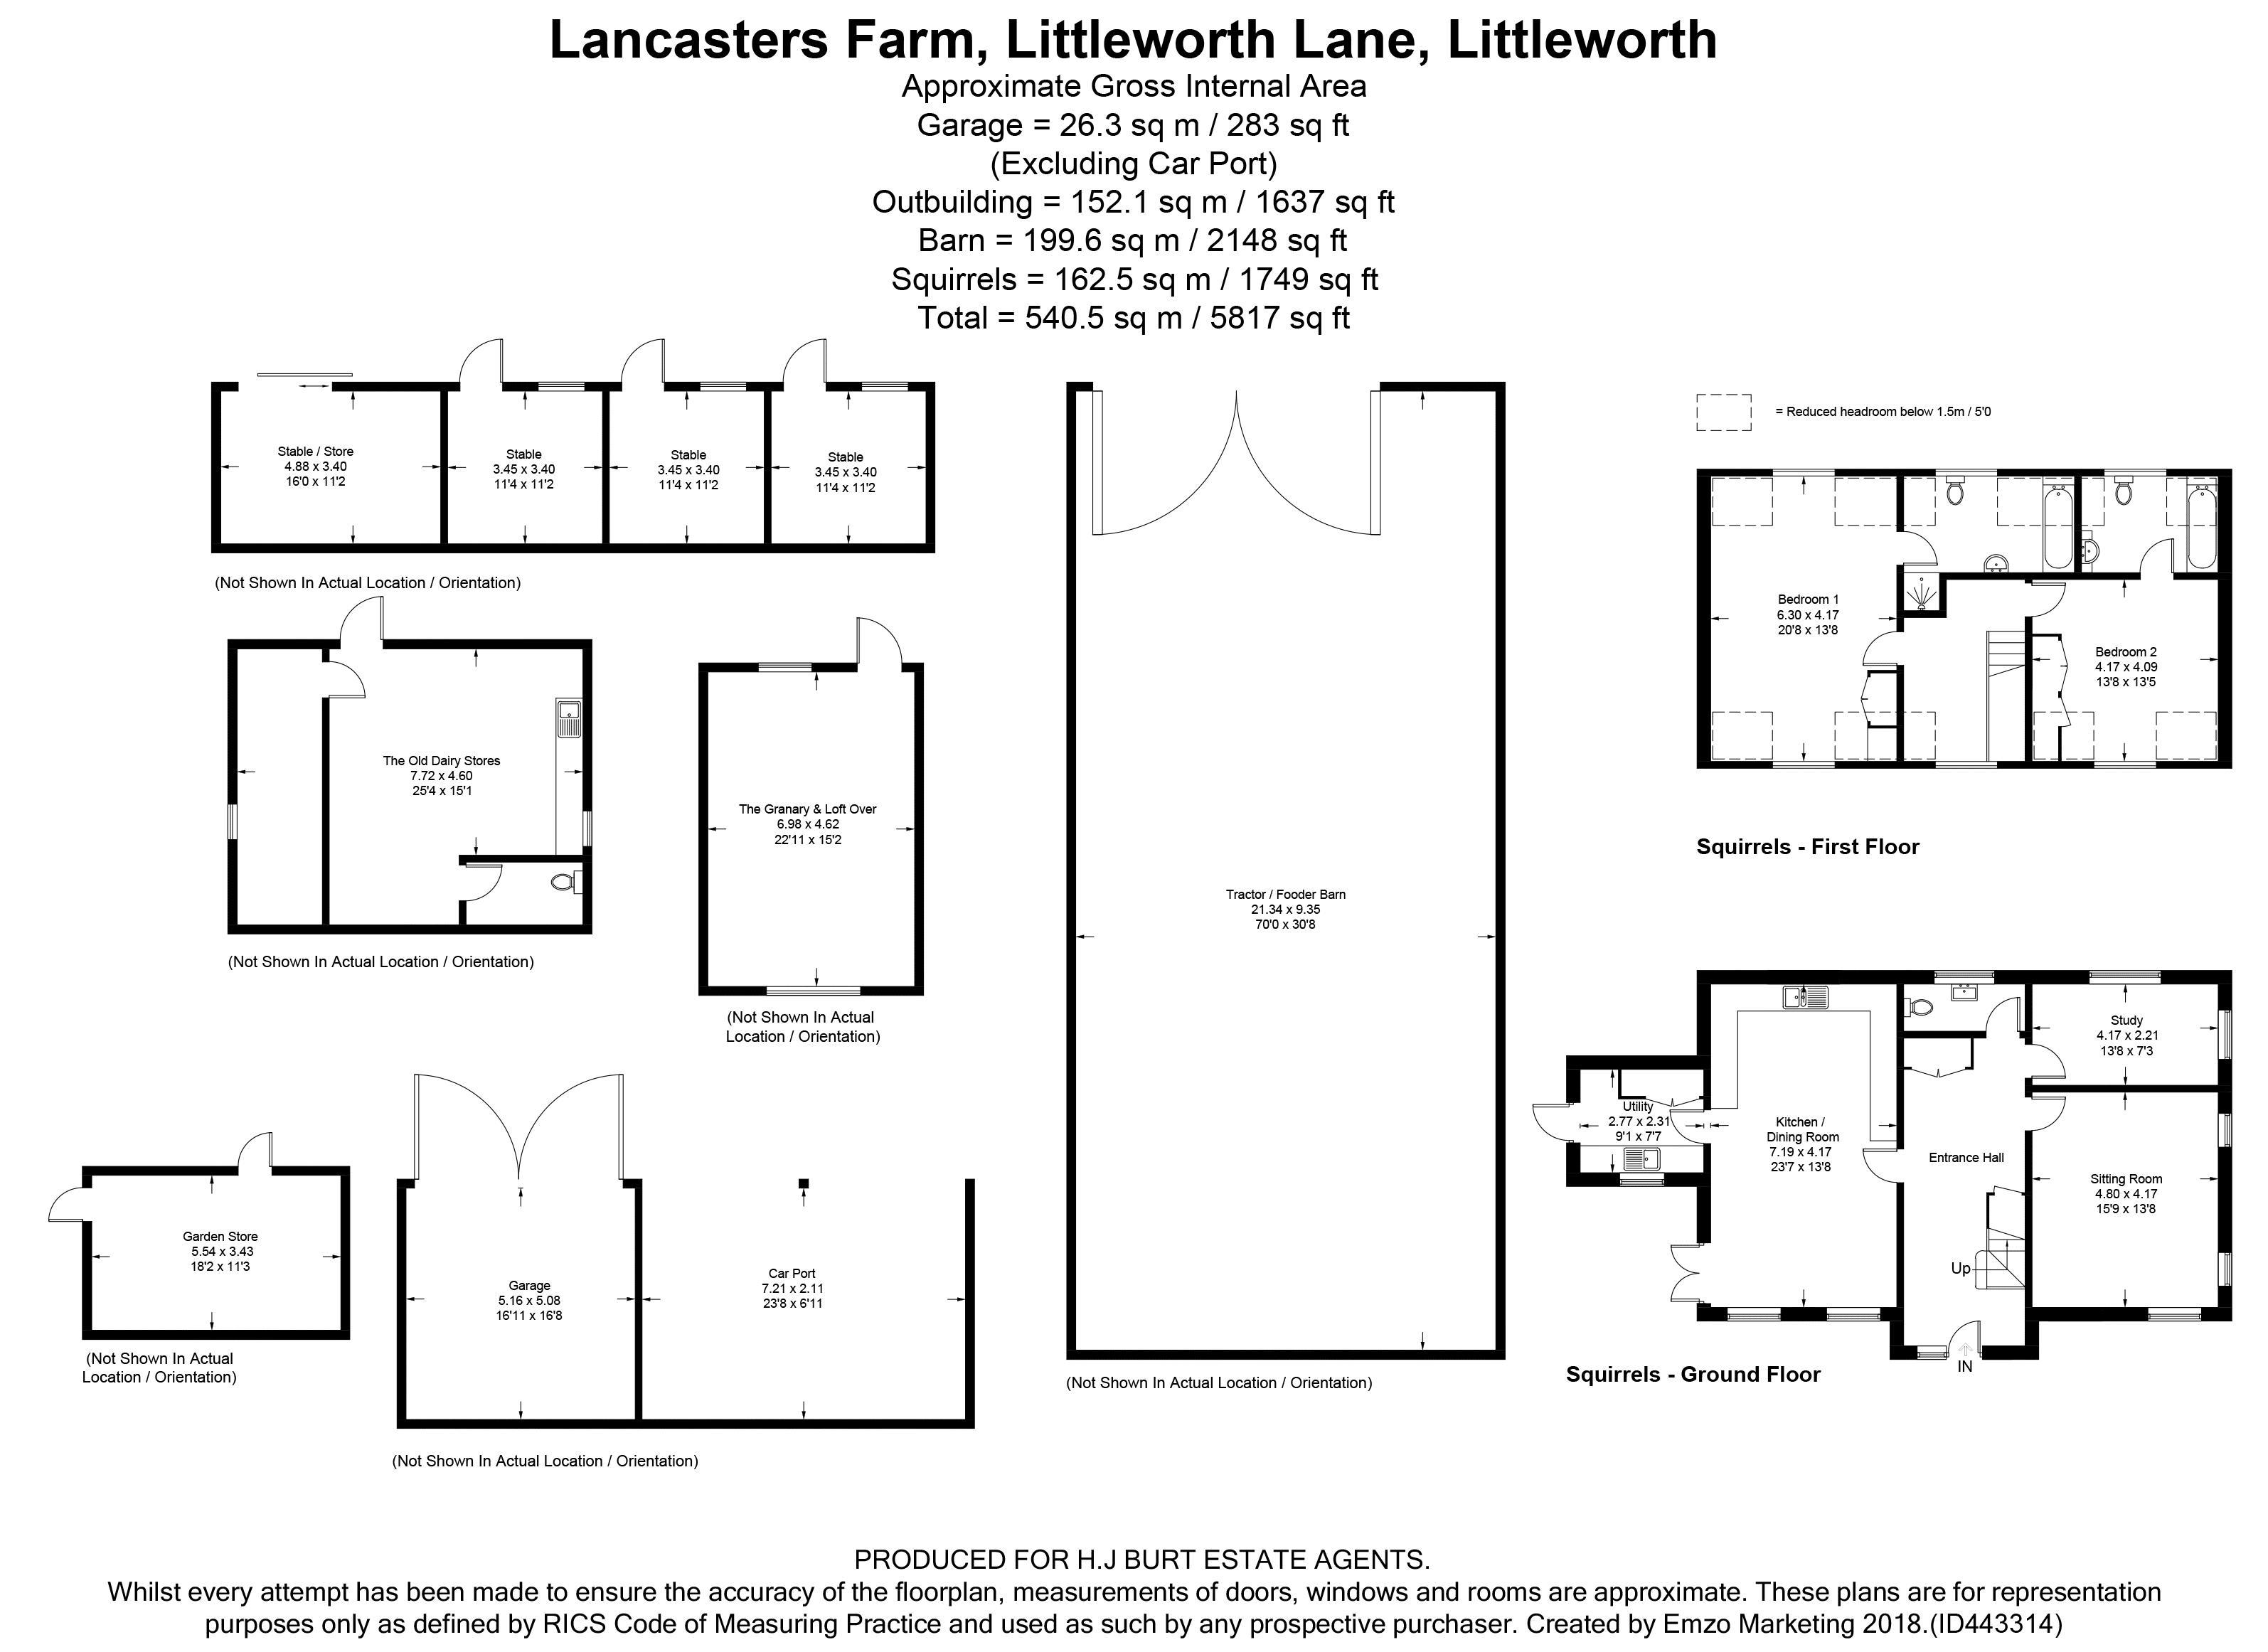 Littleworth Lane